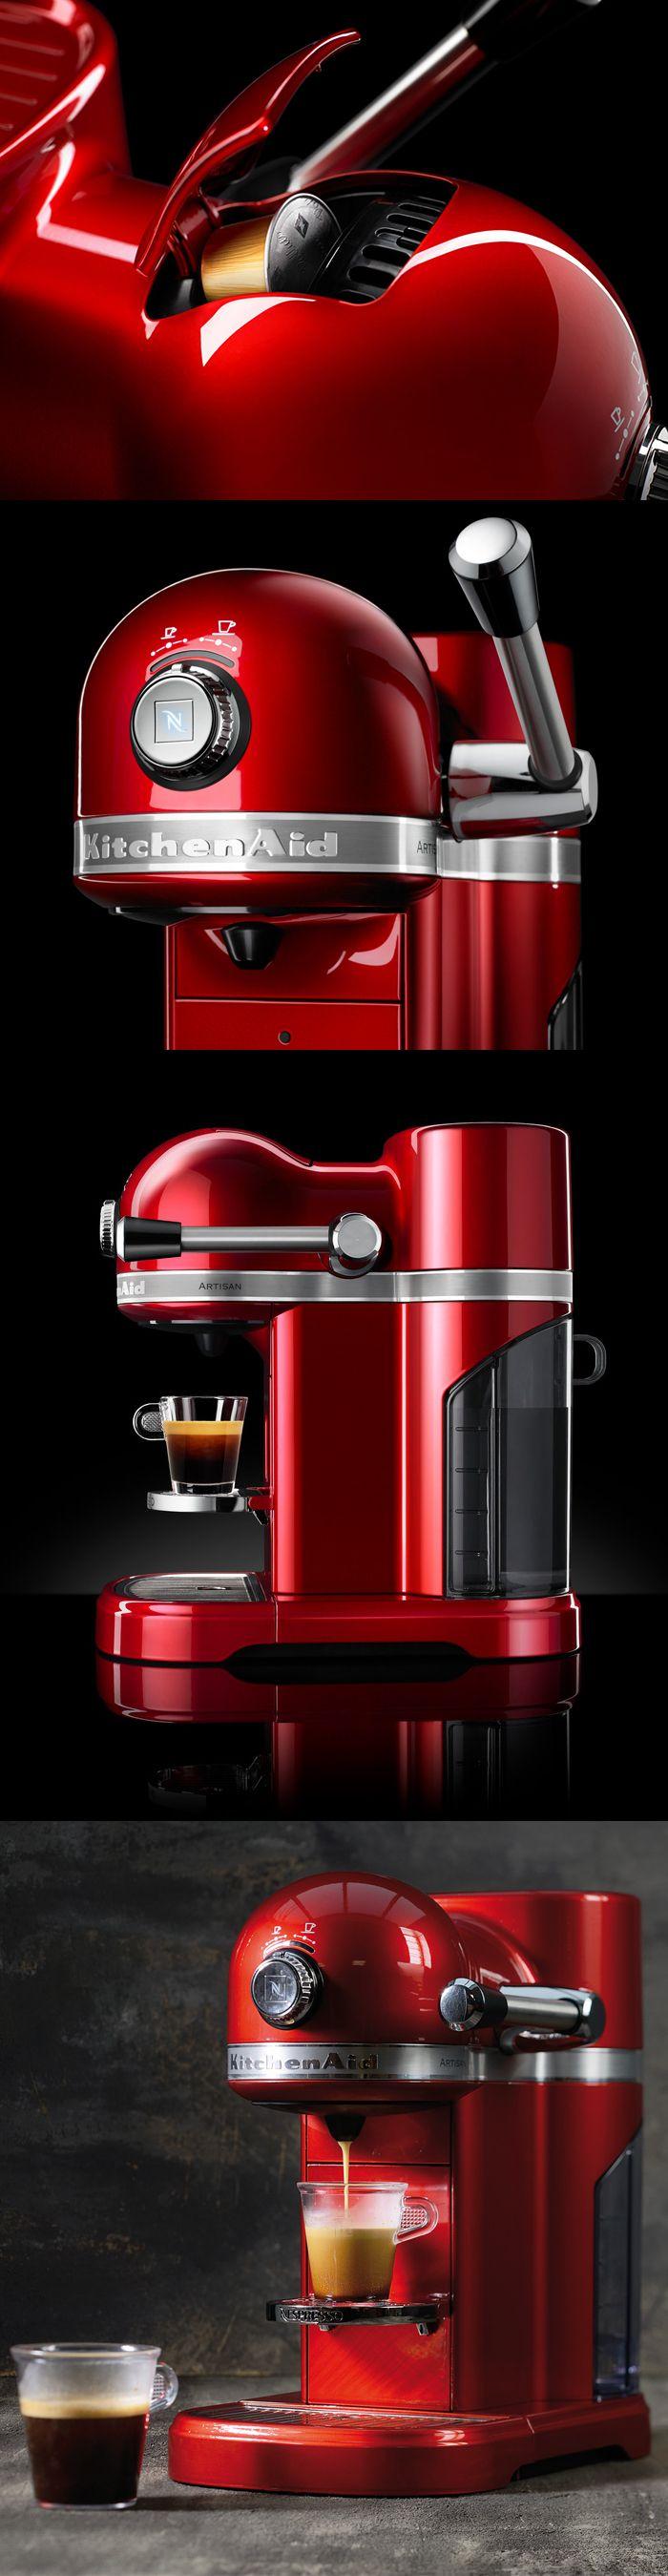 Kitchenaid Artisan Nespresso Coffee Machine Capsule Coffee Machine Kitchenaid Artisan Coffee Machine Design